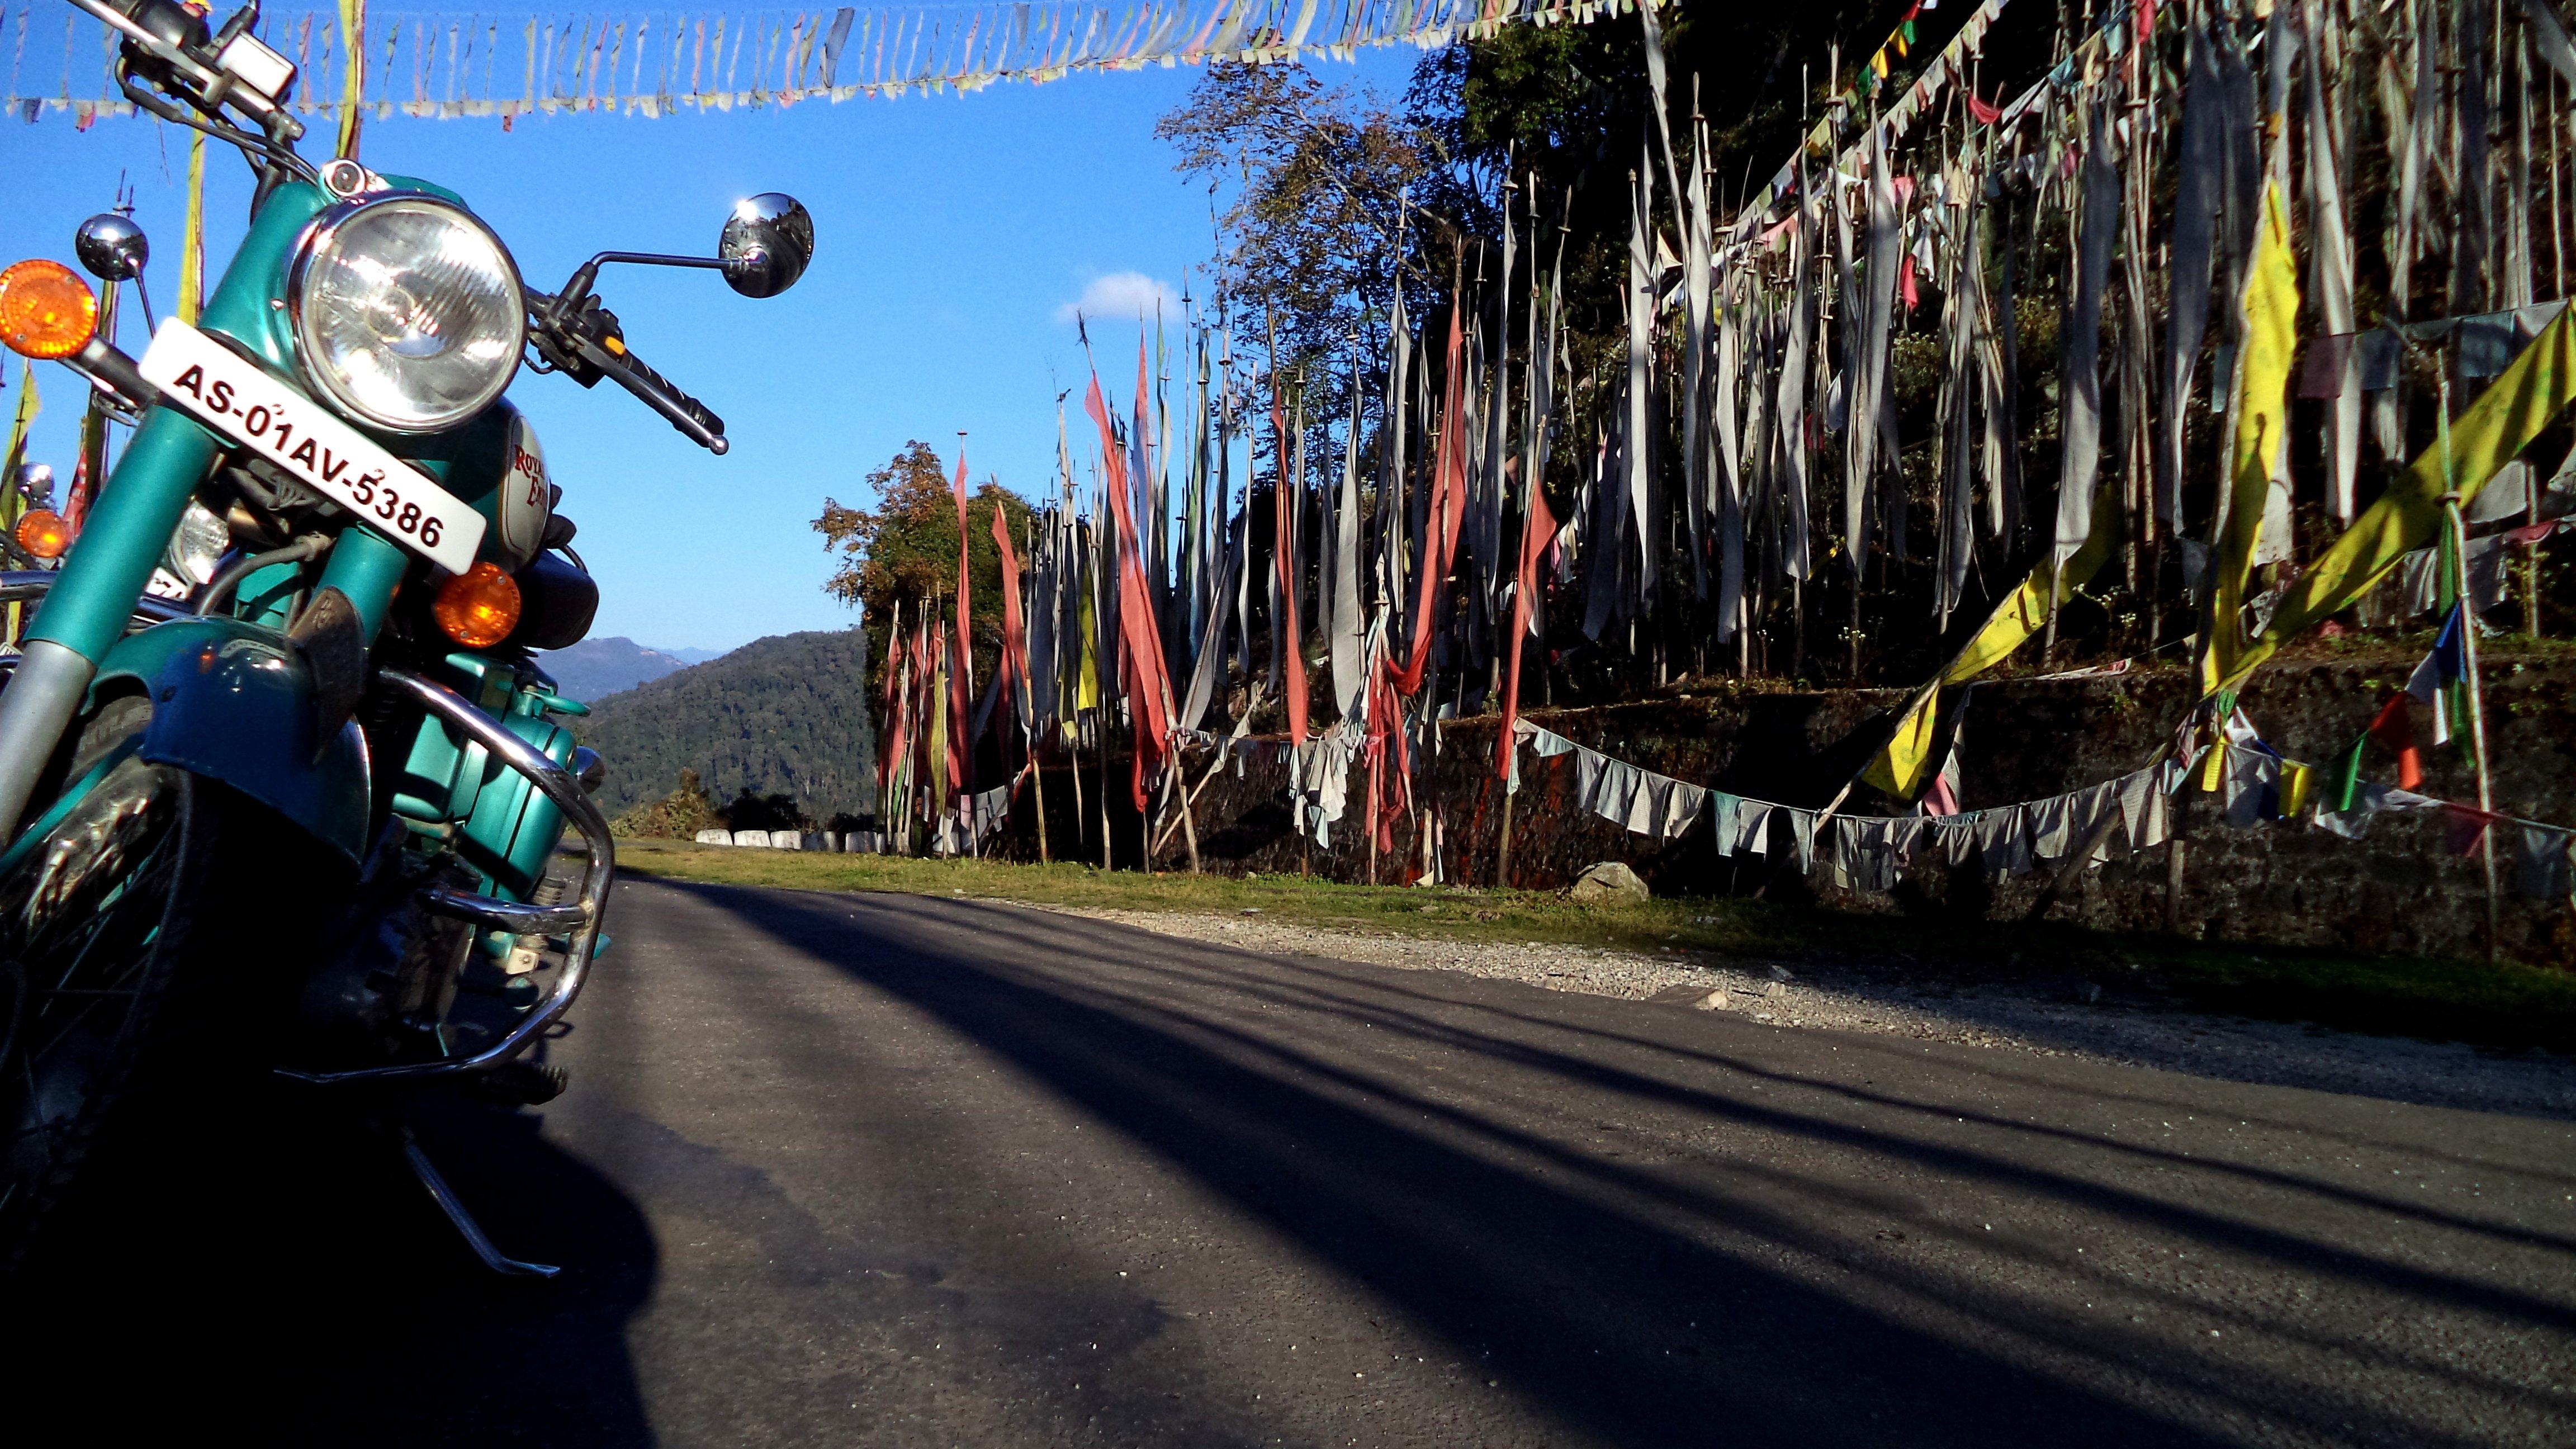 Motorcycle road trip Nepal & Bhutan - The Dragon Kingdom